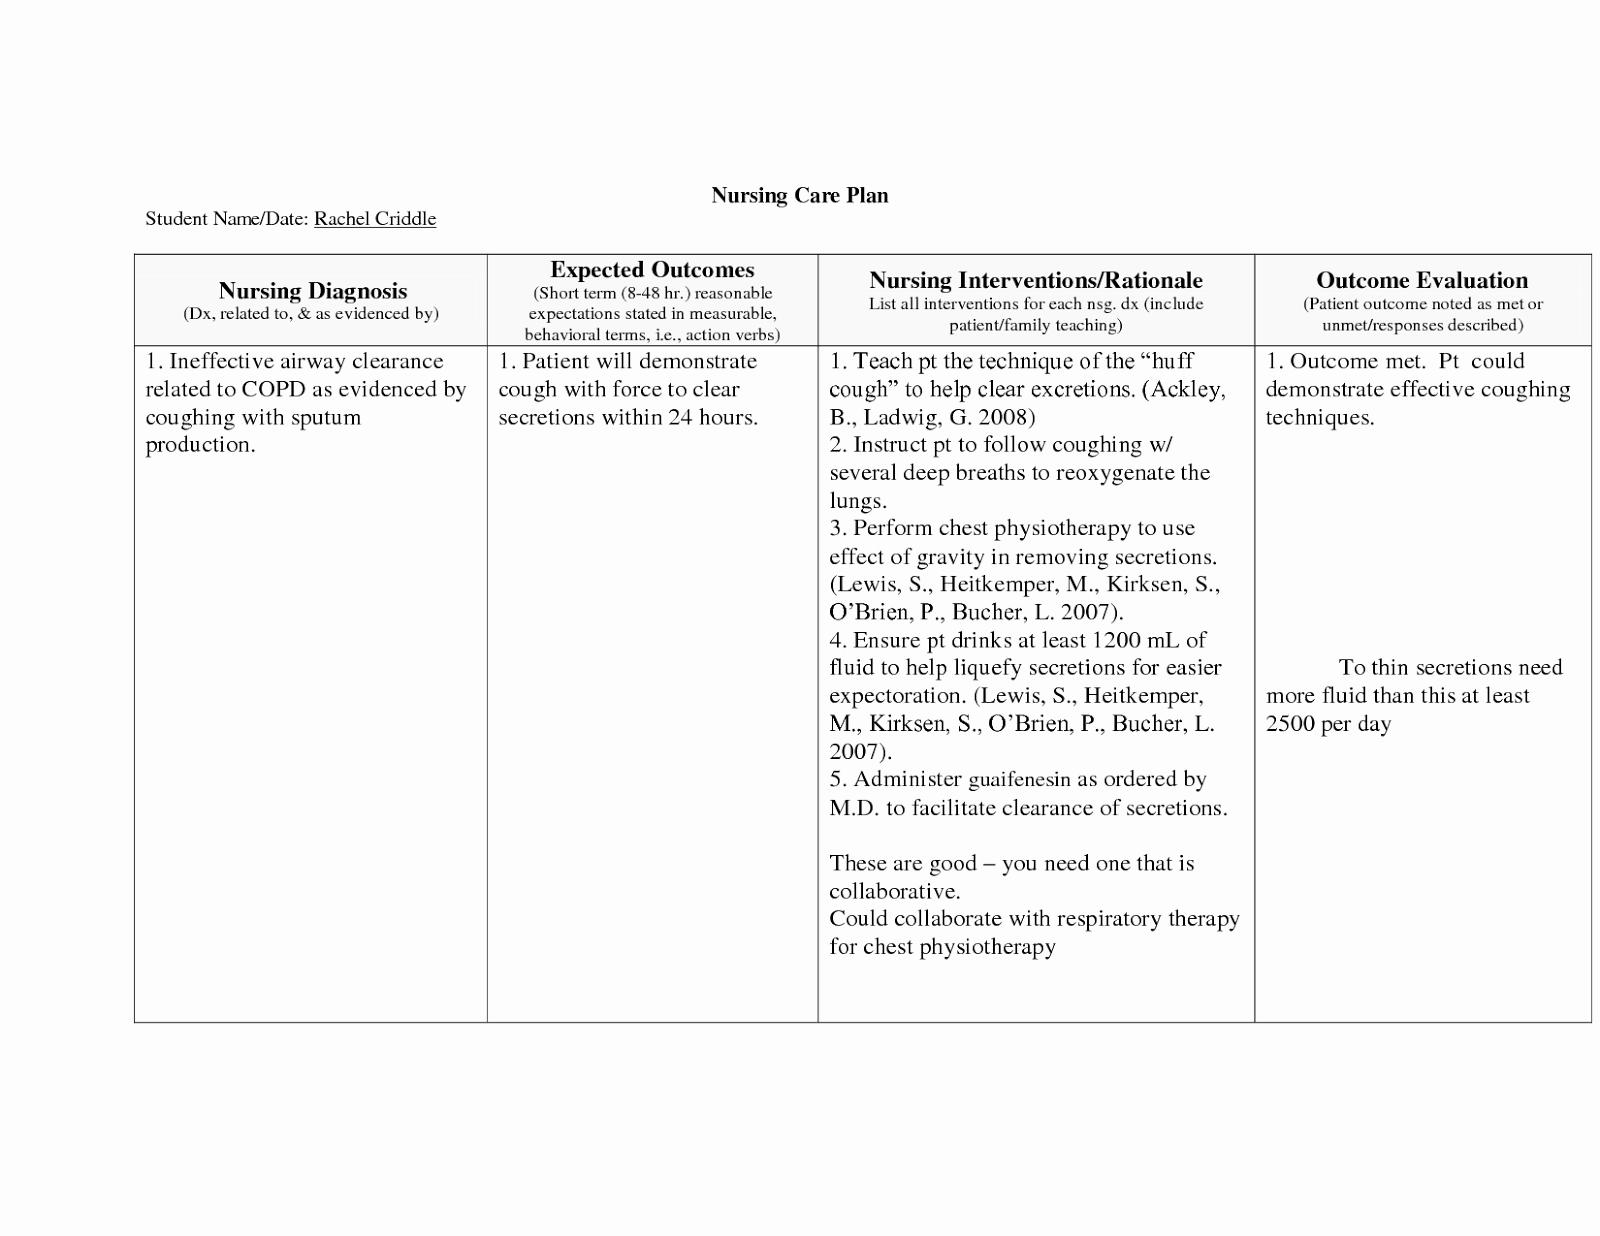 Nursing Care Plans Template Best Of Copd Nursing Care Plan Nursing Care Plan Examples